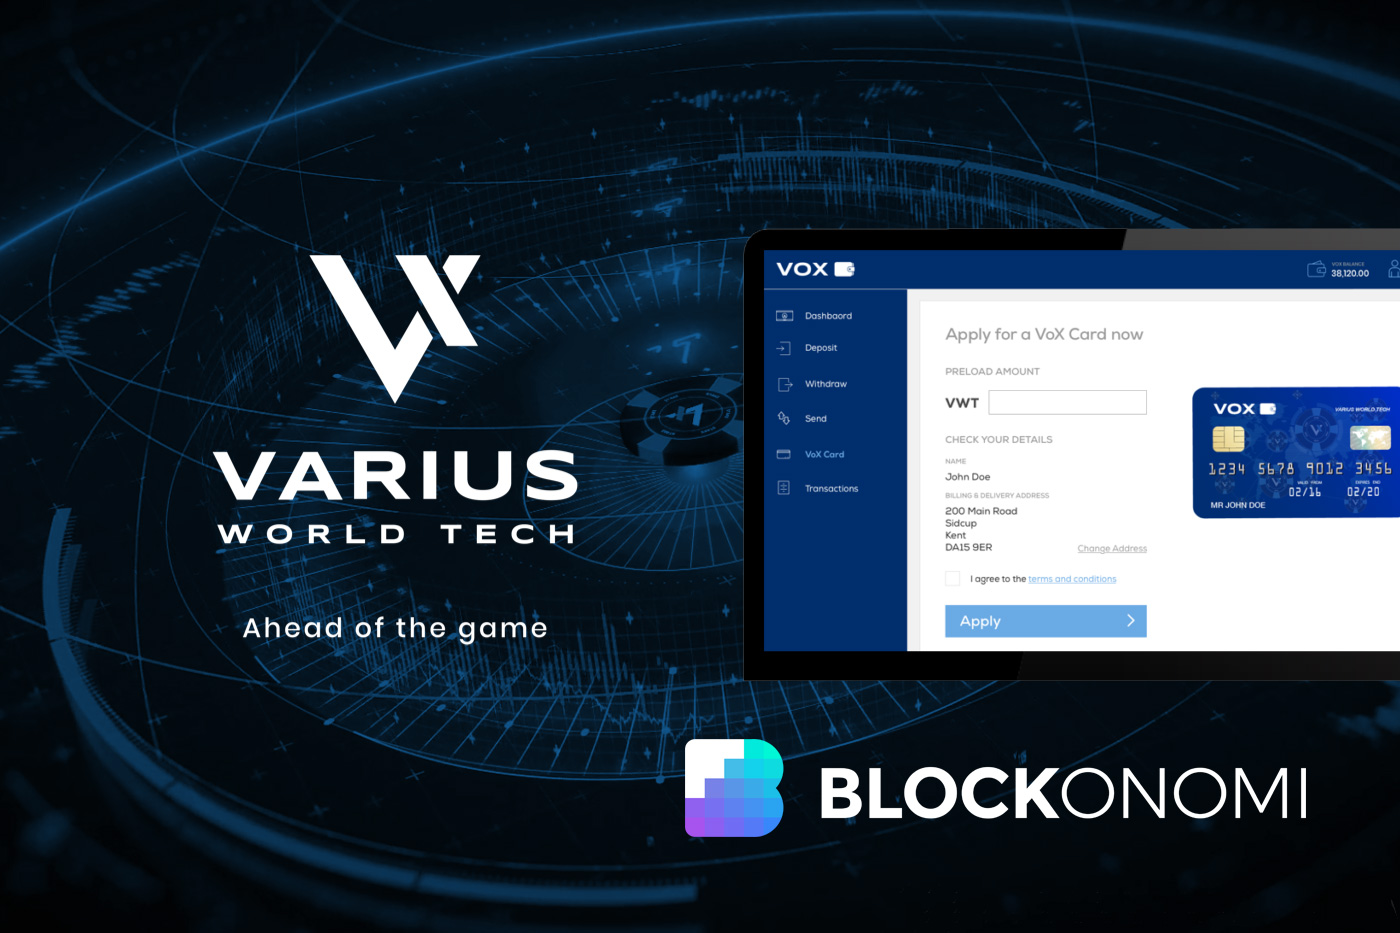 Varius World Tech